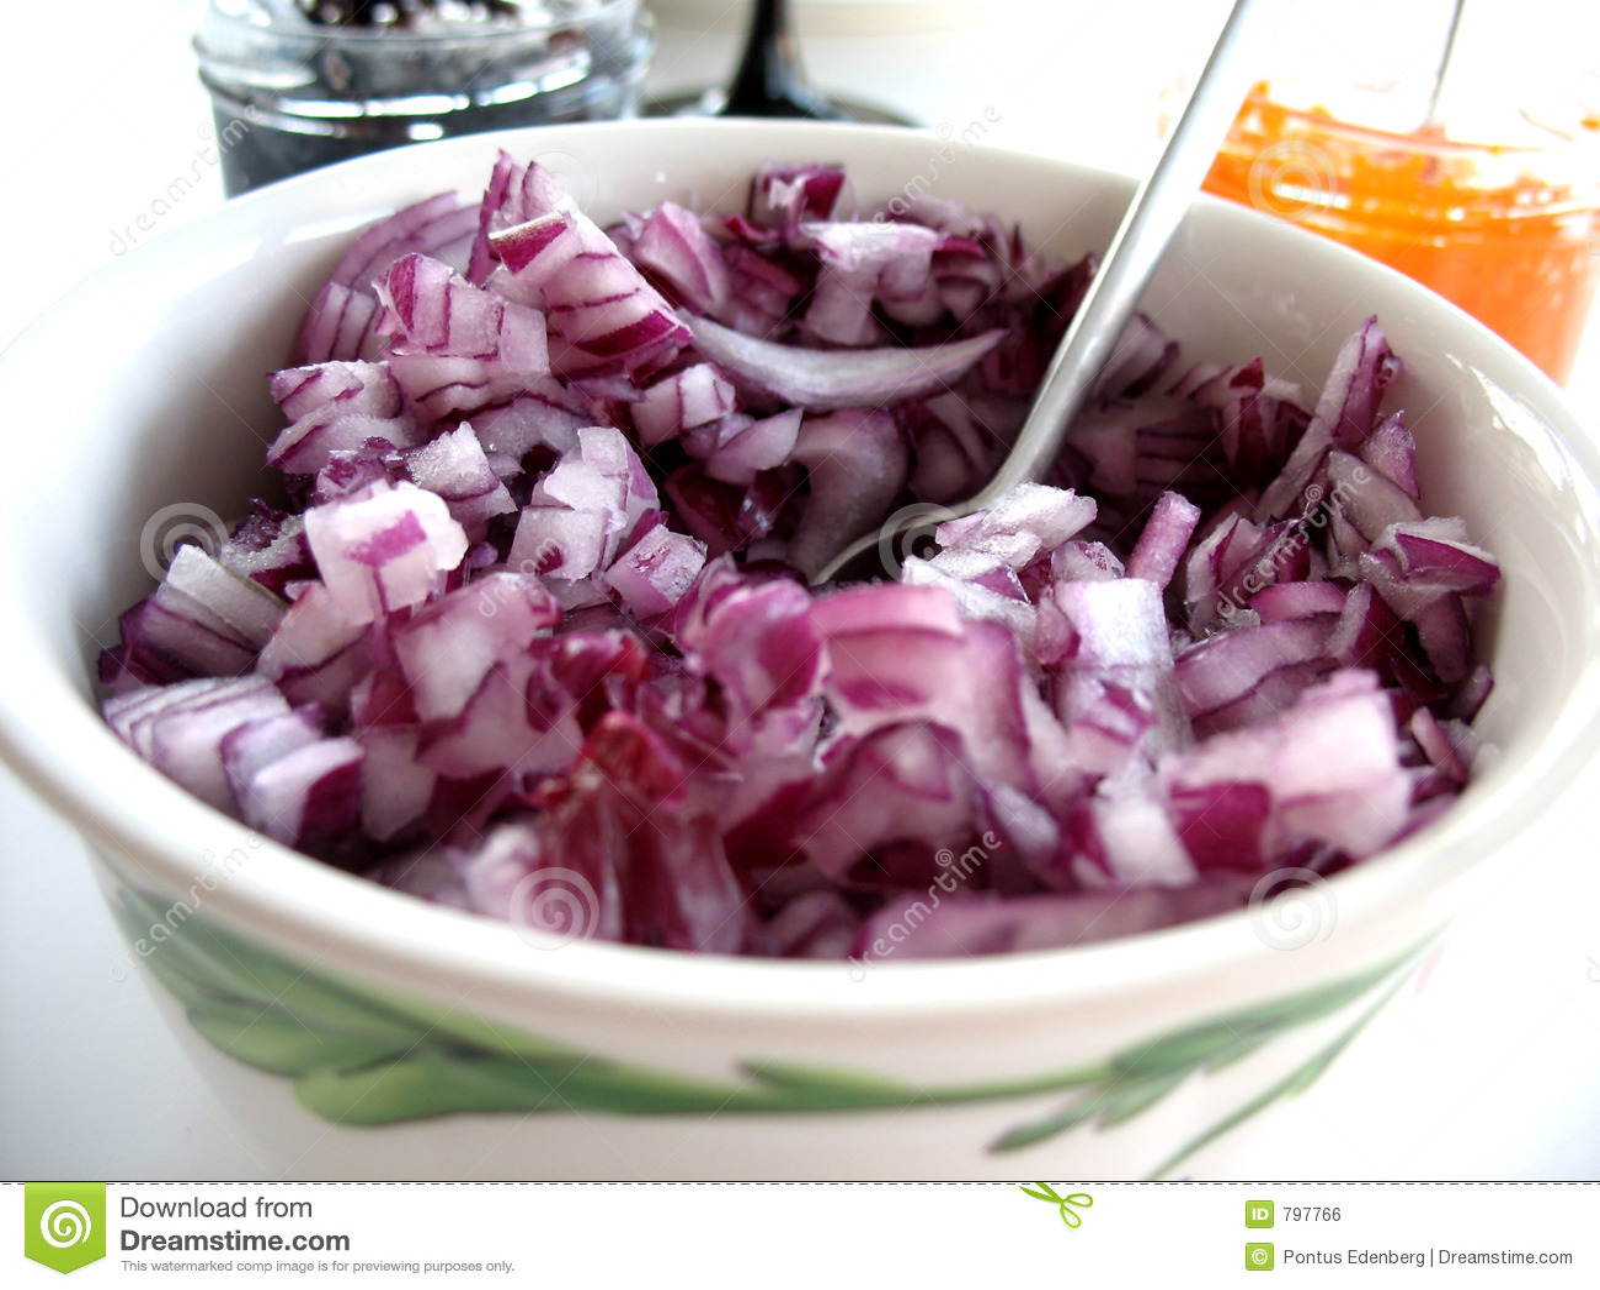 Chopped Red Onion 1 stock photo. Image of desert, dinner ...